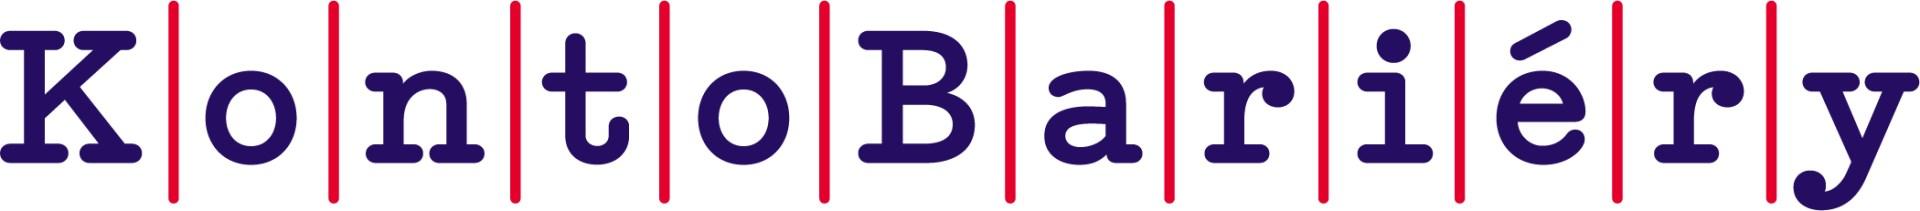 logo konto bariéry